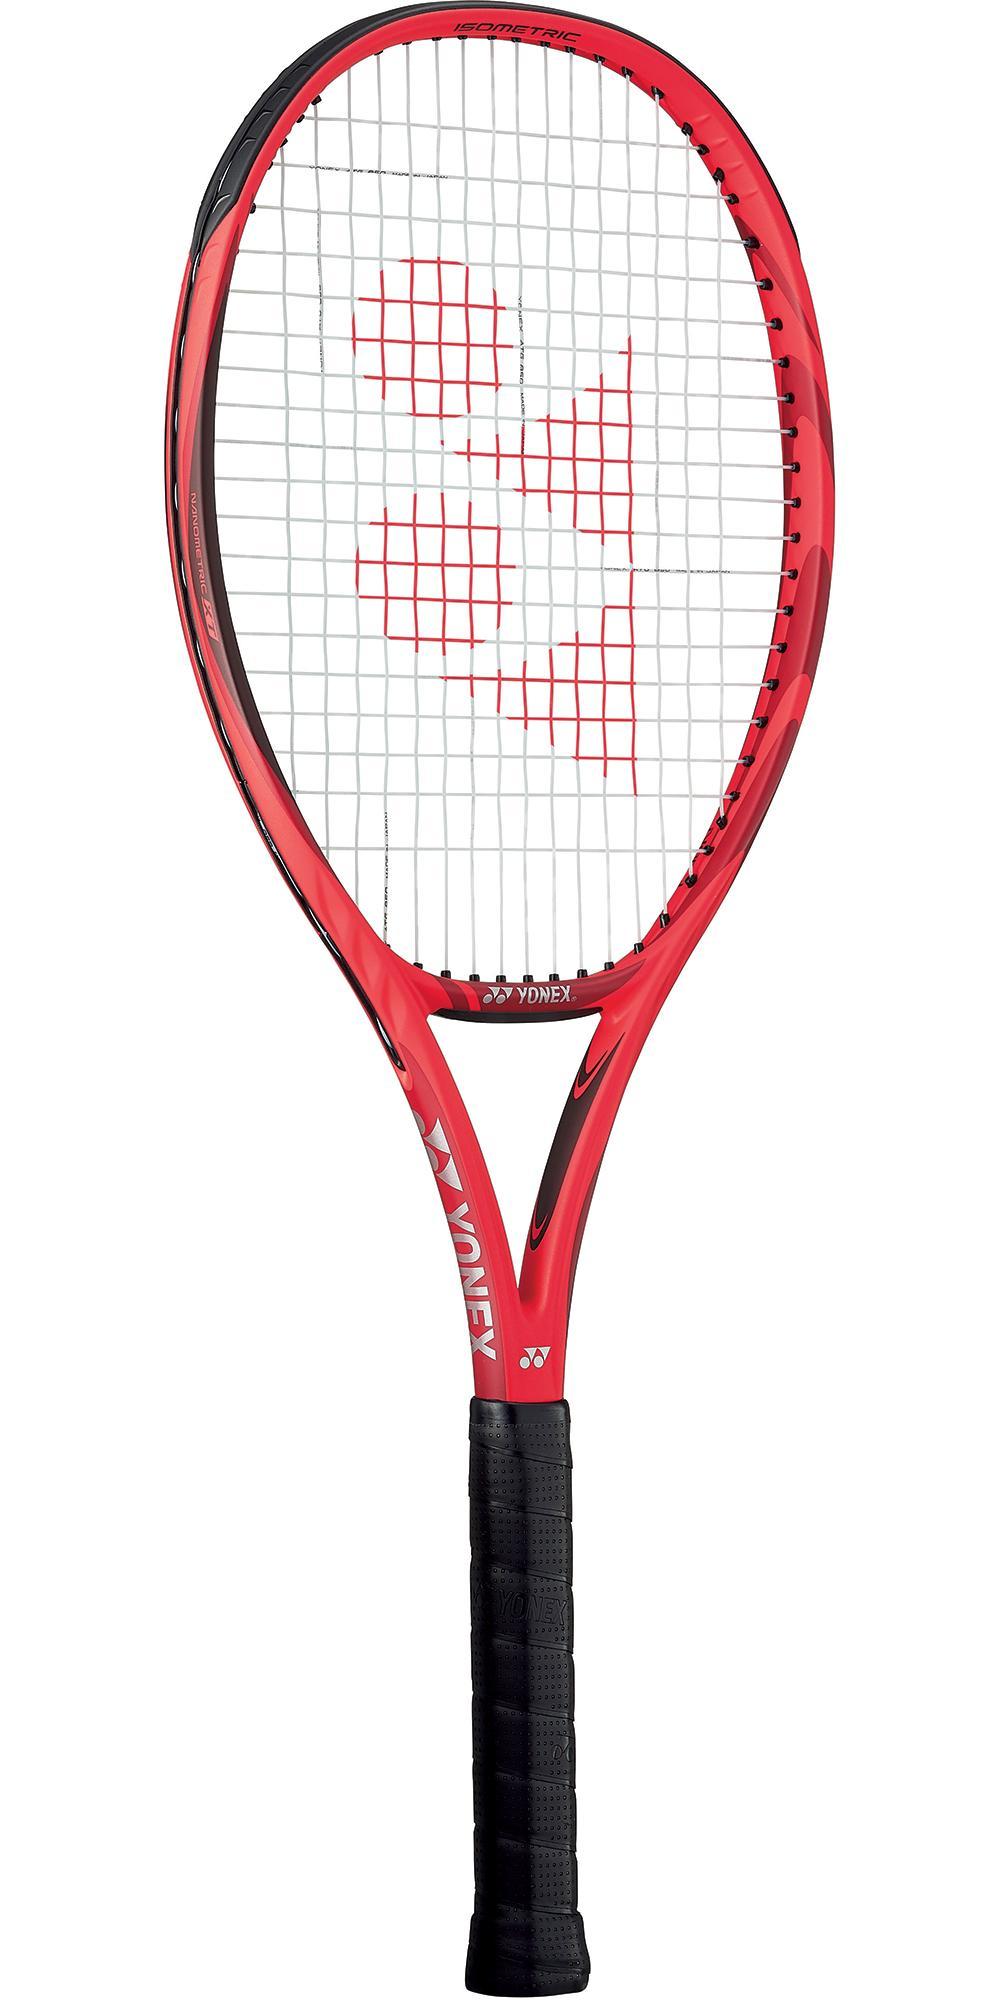 Yonex VCORE 100 300g Tennis Racket - Tennisnuts.com